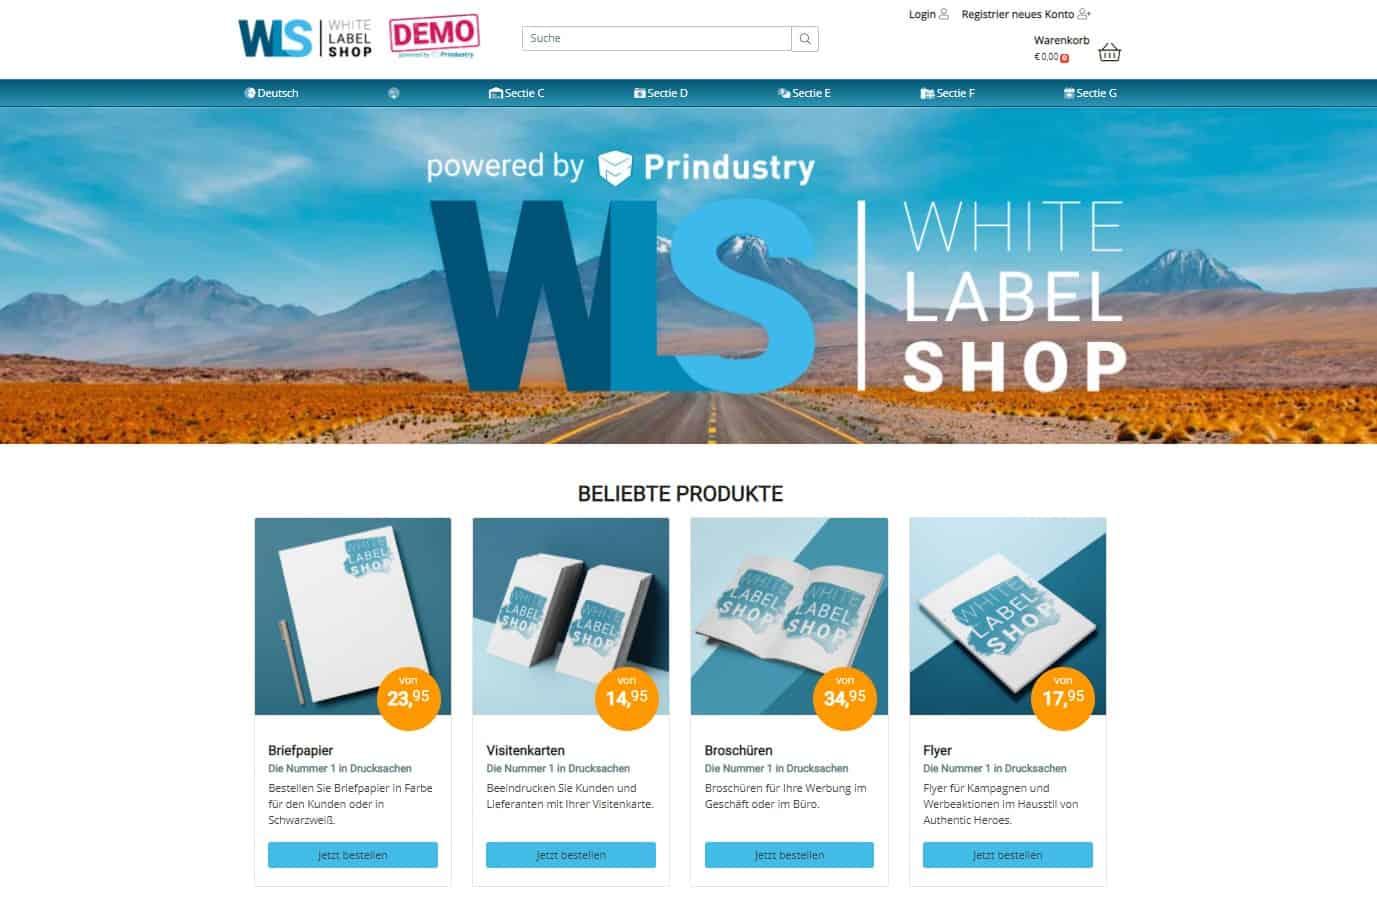 Prindustry WhiteLabelShop Deutschland